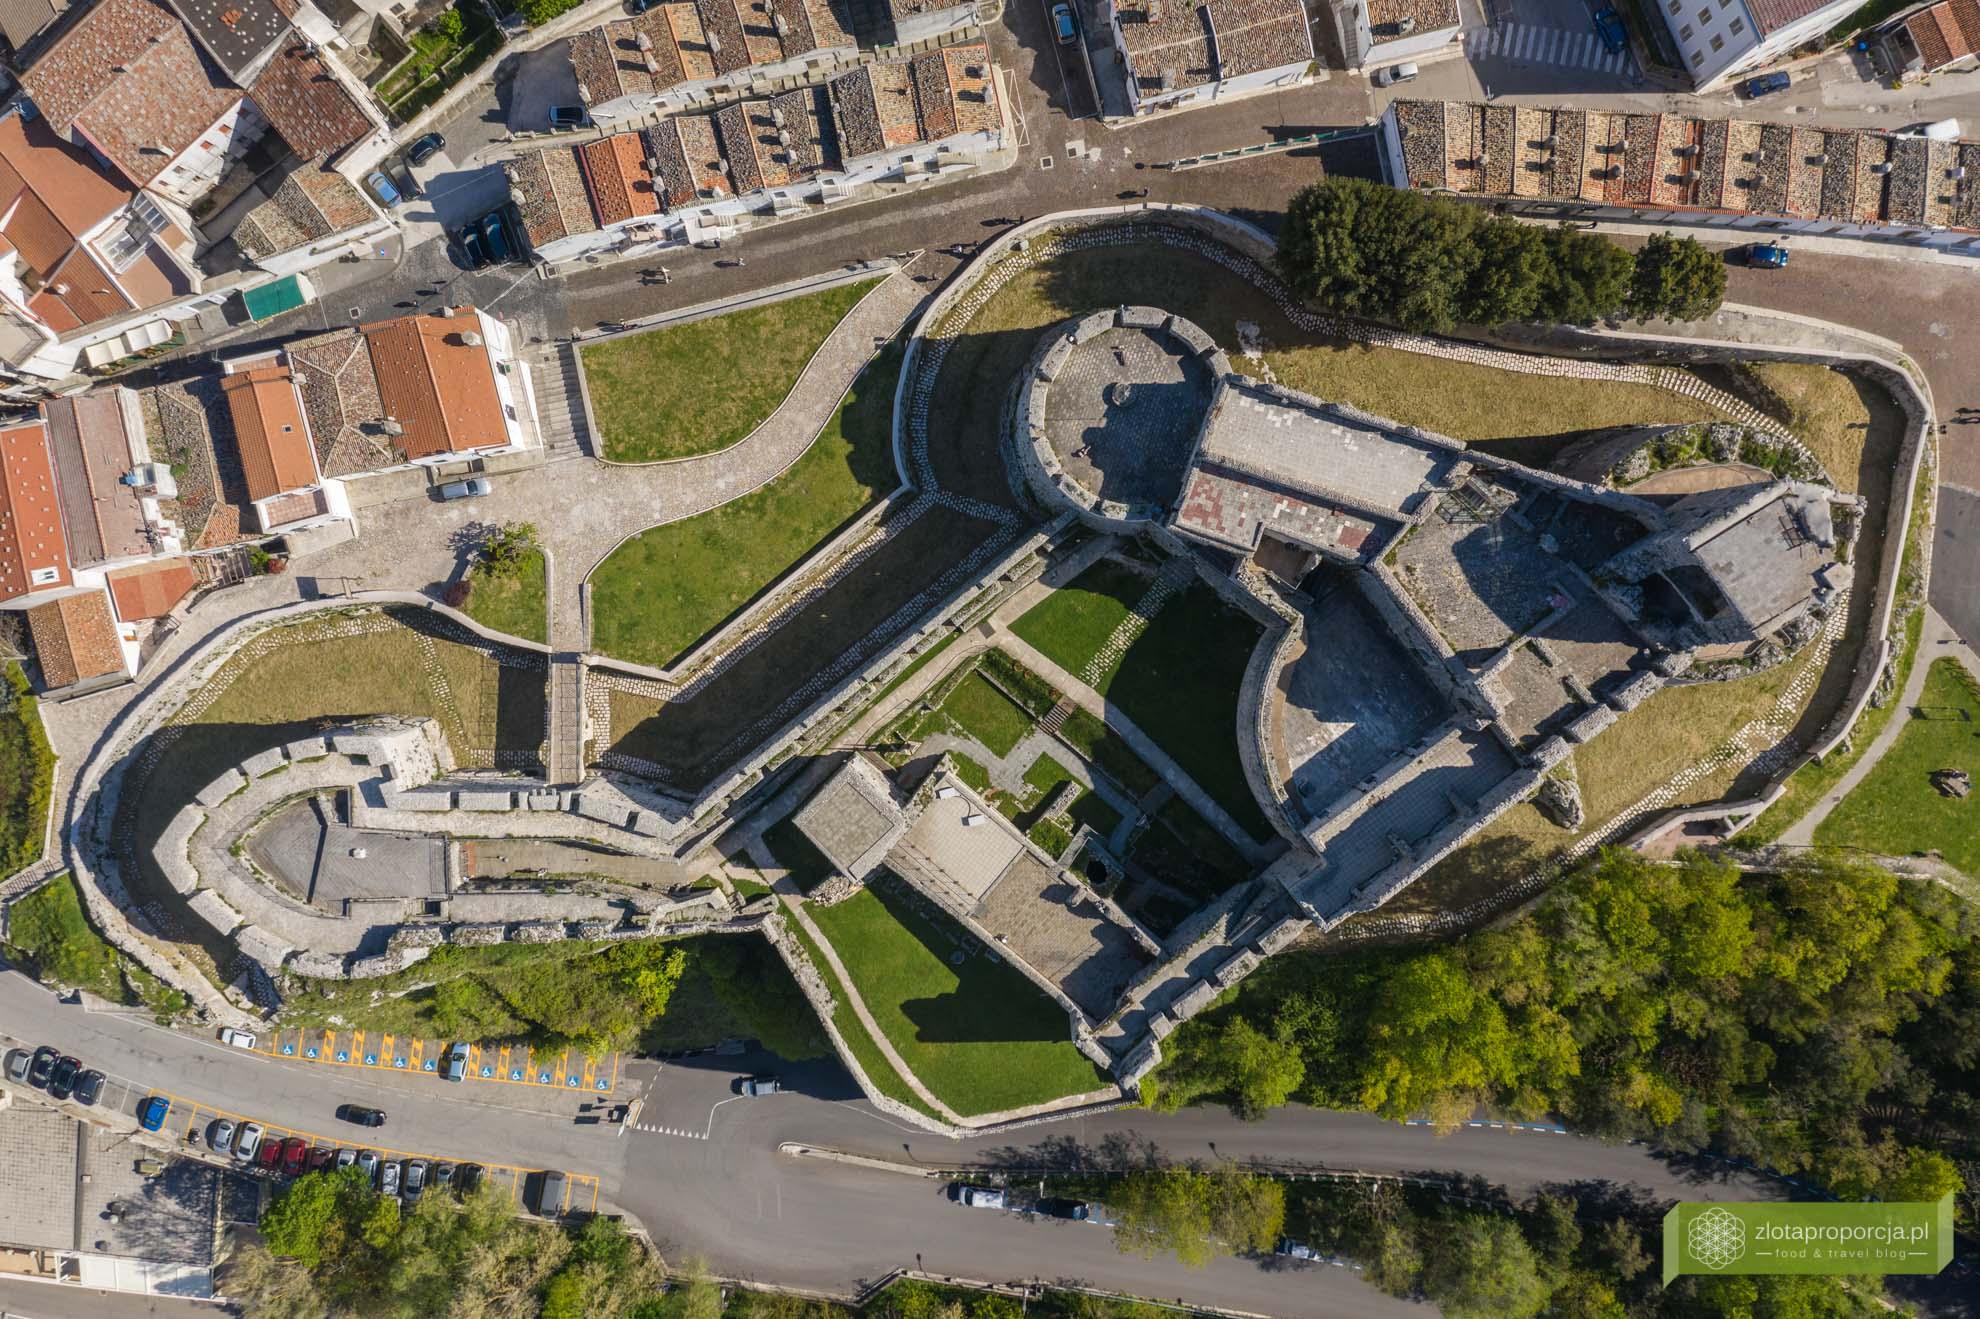 Gargano; Apulia; atrakcje Gargano; co zobaczyć na Gargano; atrakcje Apulii; Monte Sant'Angelo; zamek w Monte Sant'Angelo;